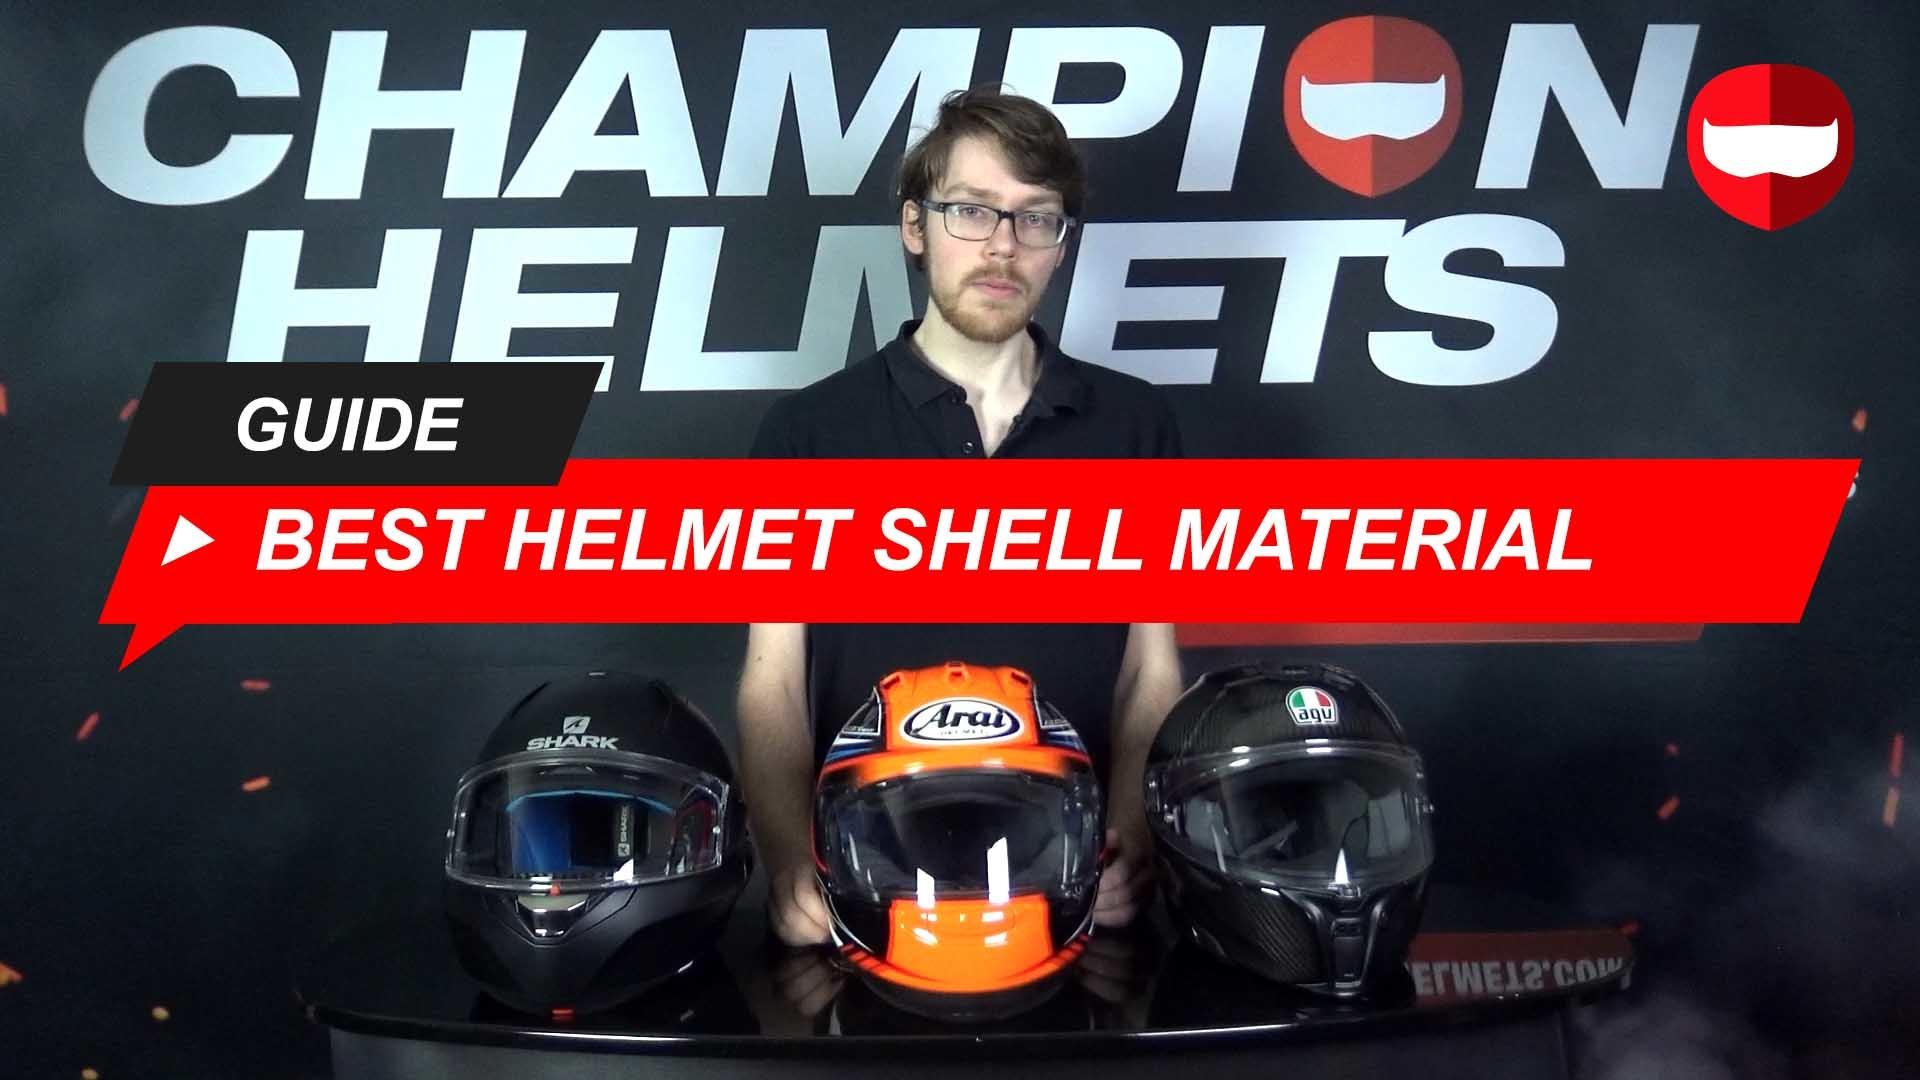 Polycarbonate vs Fiberglass vs Carbon Fiber Shell Motorcycle Helmets + Video